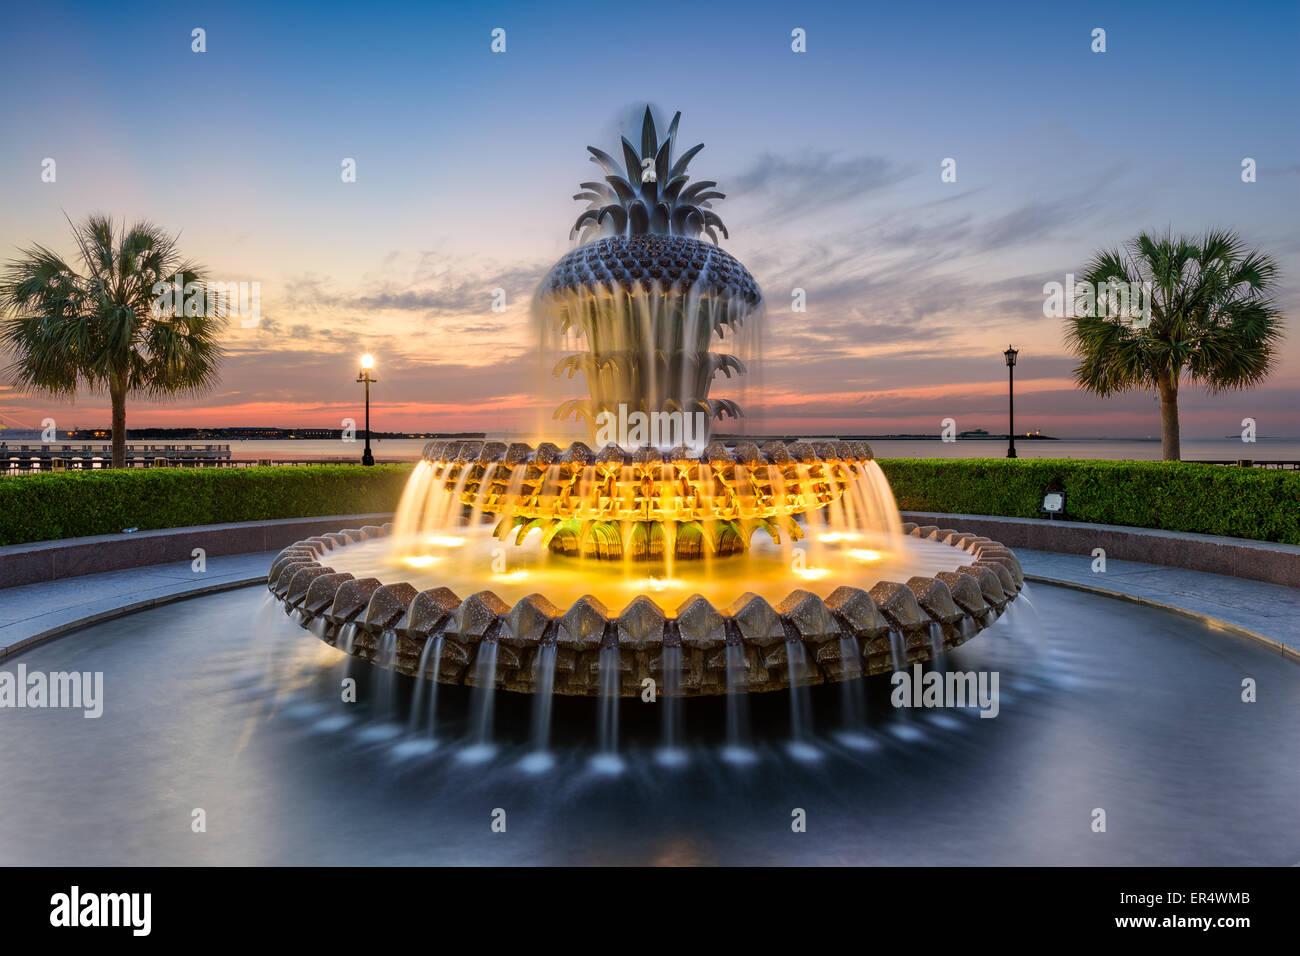 Charleston, South Carolina, USA at the Waterfront Park Pineapple Fountain. - Stock Image